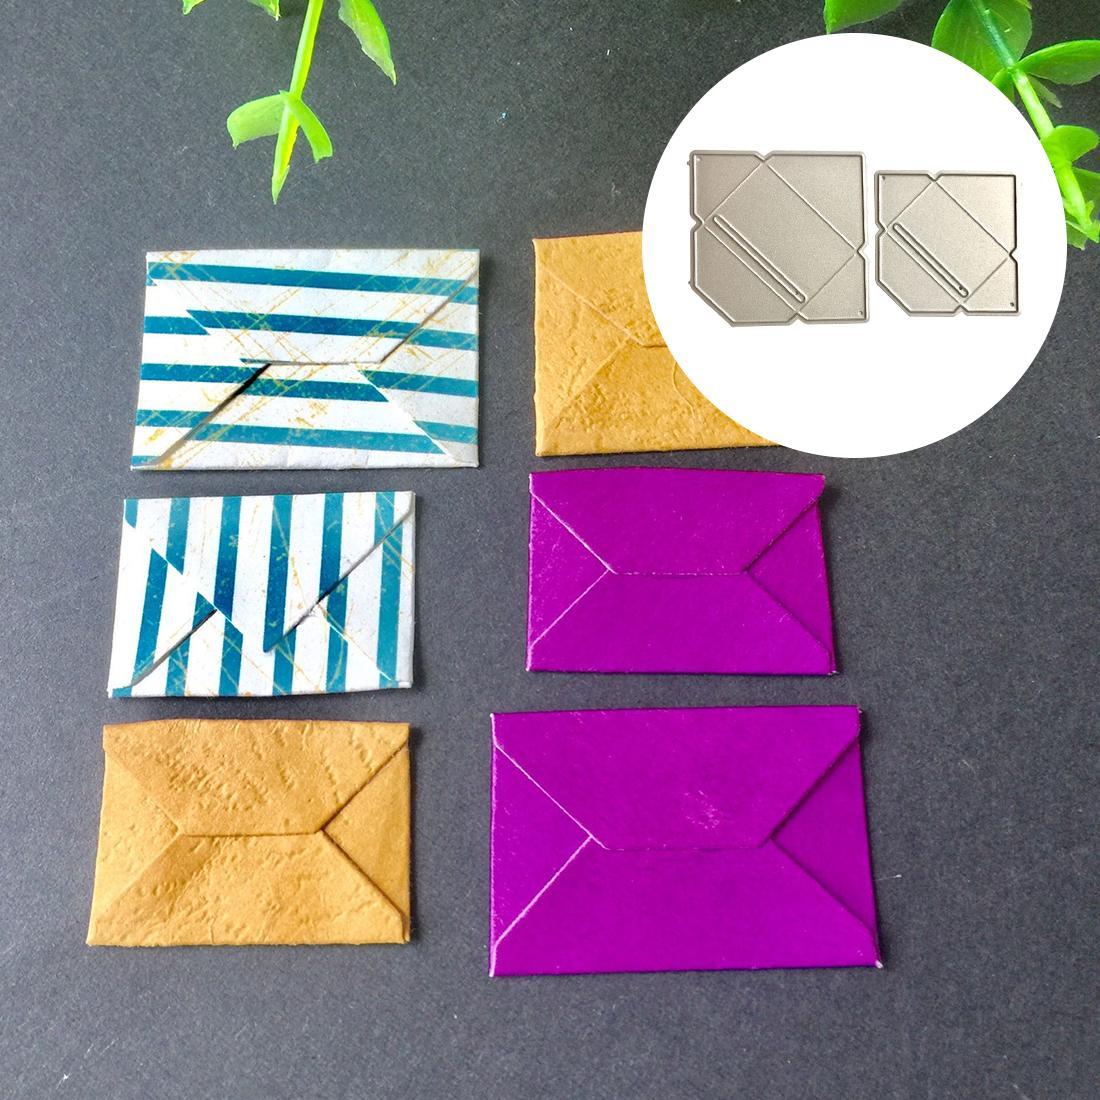 Envelope Metal Die Cuts Cutting Dies for DIY Scrapbooking stitch Embossing Paper Cards Making Decorative Craft Supplies 6Pcs/set